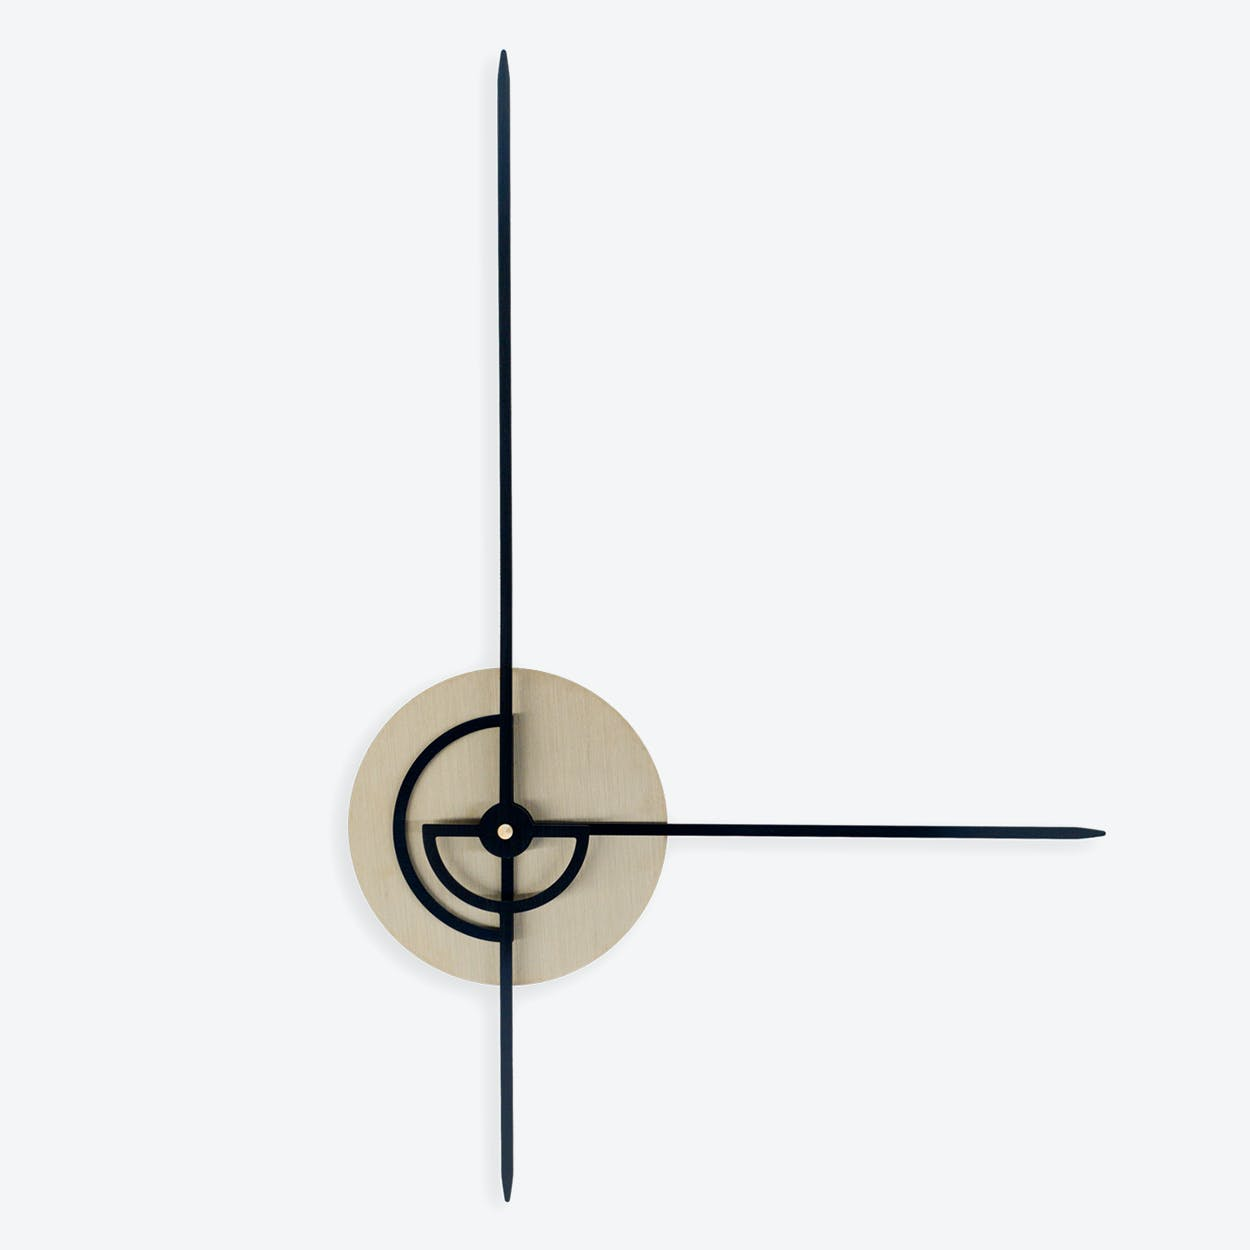 Phei Wall Clock - Brass & Black